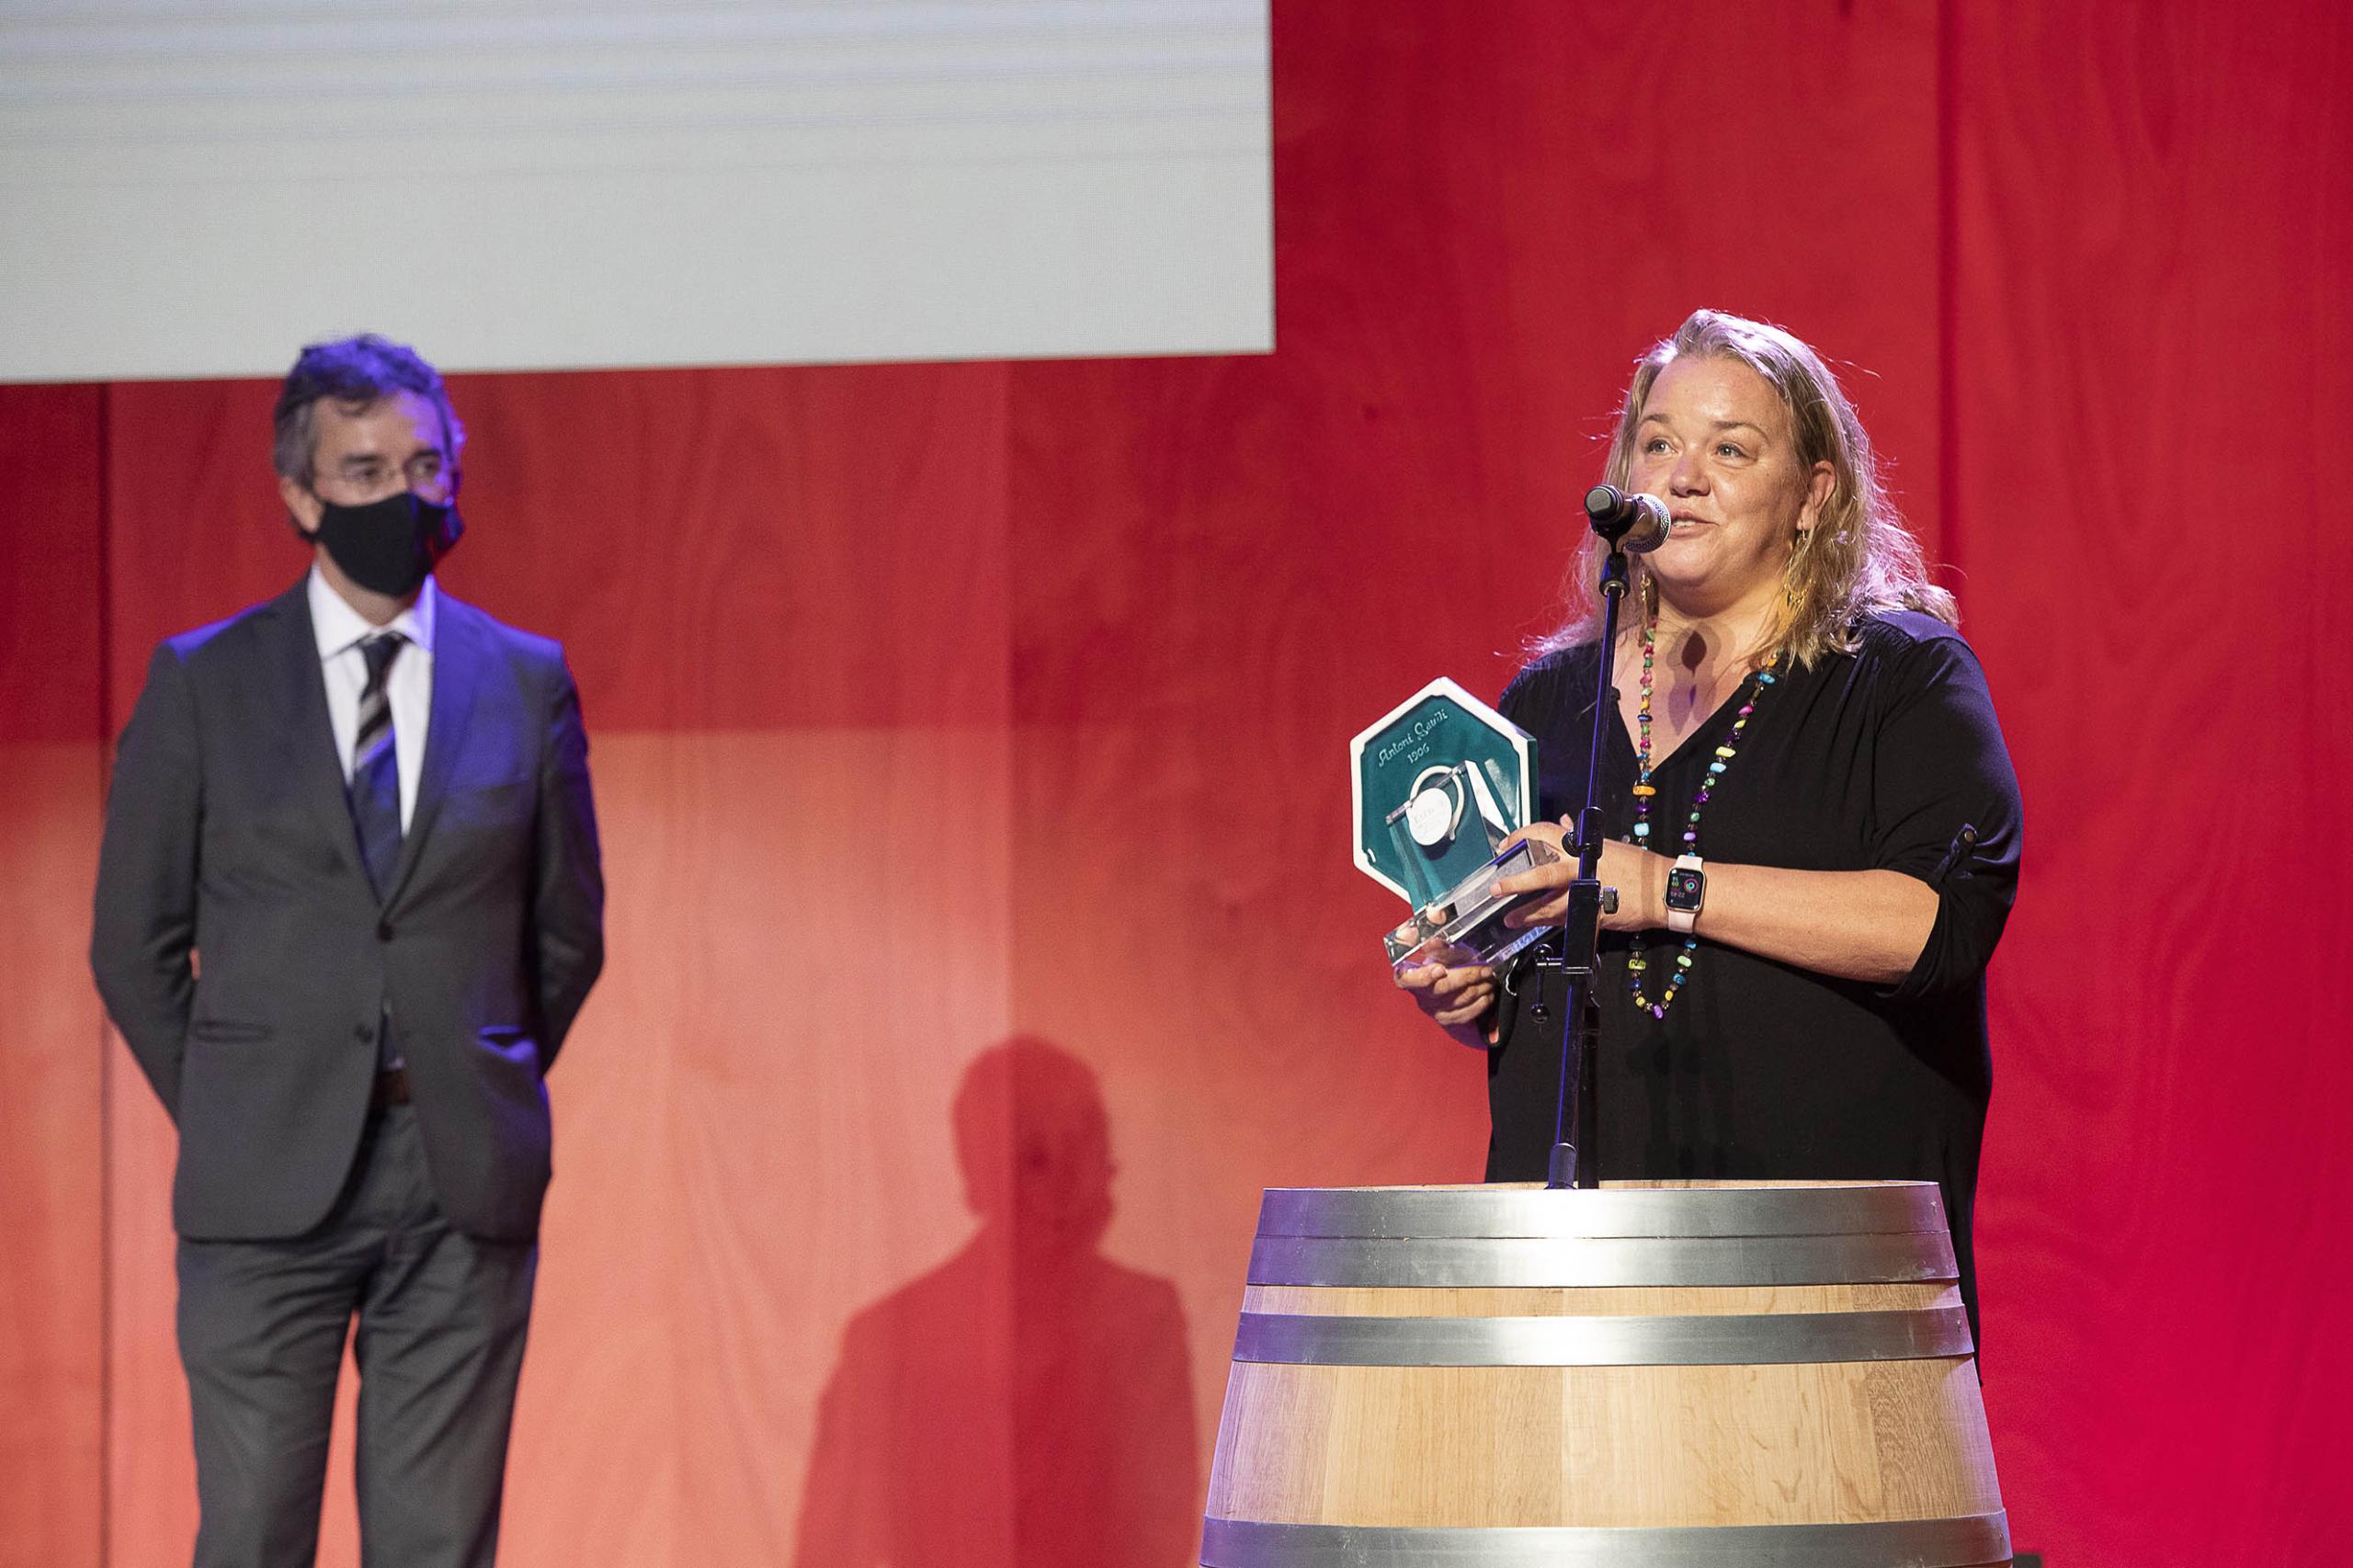 Premis Vinari 2021, la Gala: Premi Turisme de Barcelona, millor iniciativa enoturística per la Carretera del Vi | Foto: Jordi Play